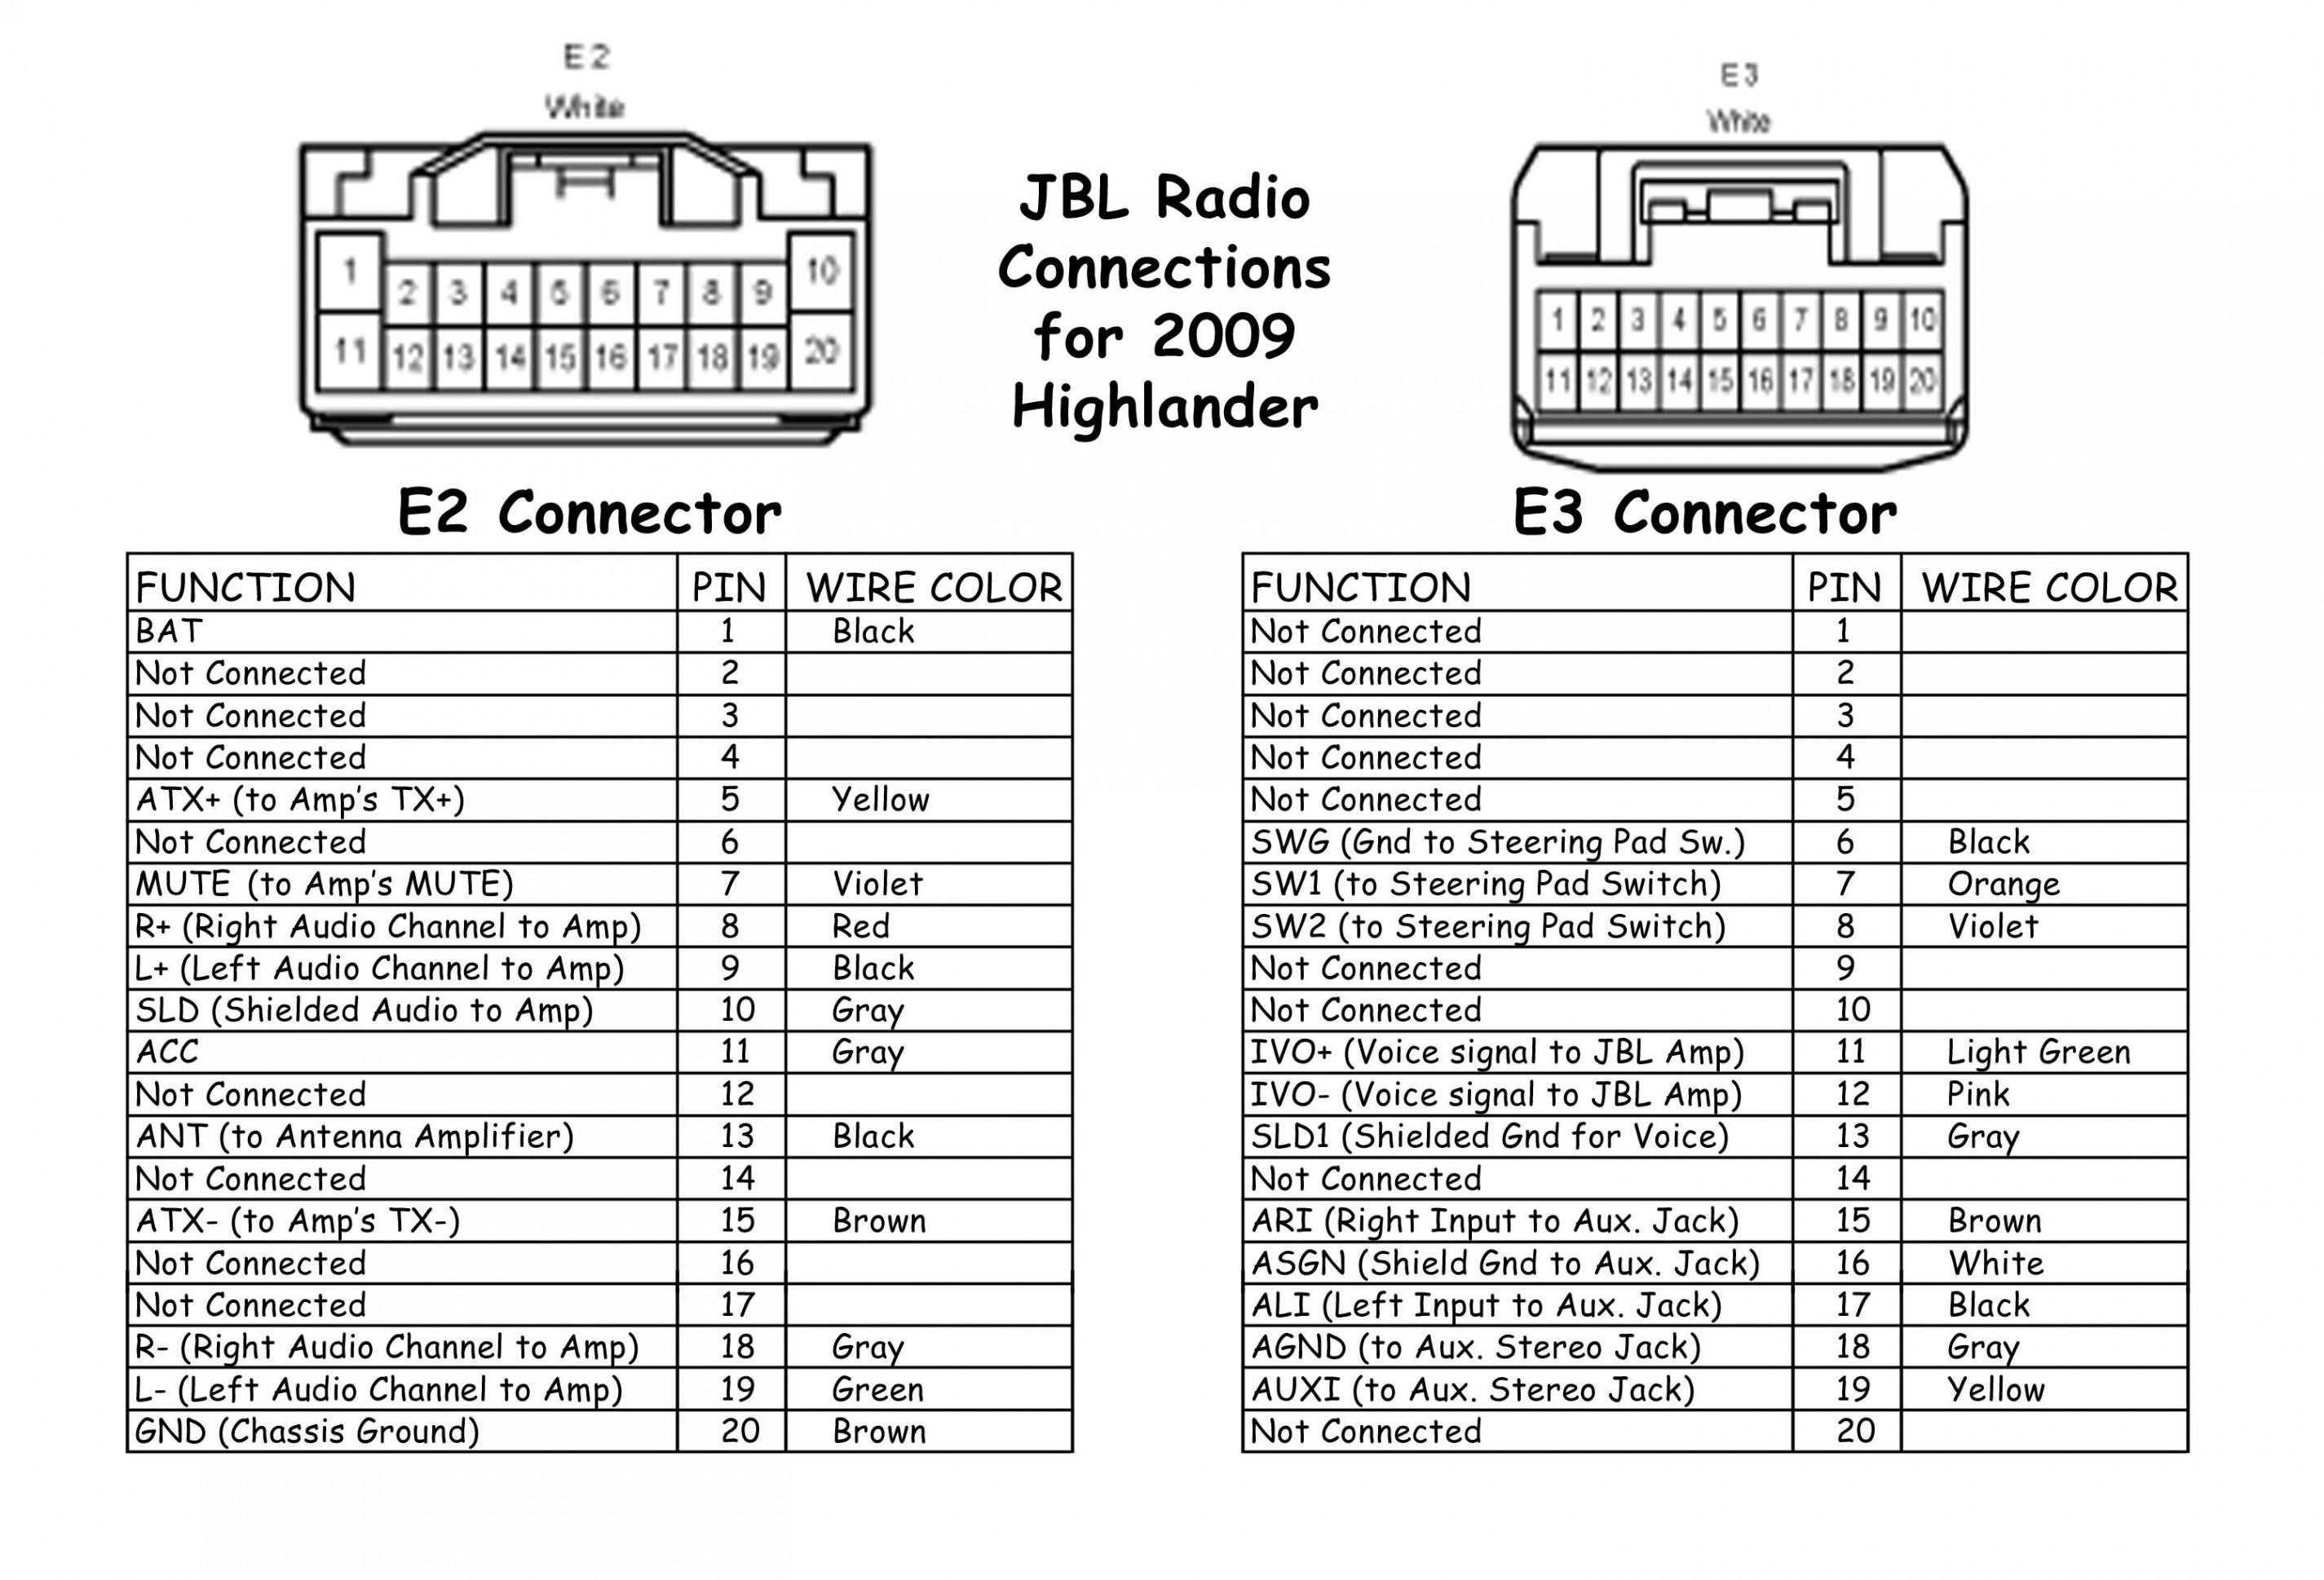 pioneer car stereo wiring diagram free Collection-Pioneer Wiring Harness Diagram – Pioneer Radio Wiring Diagram Inspirational Sony Car Stereo Wiring 9-e